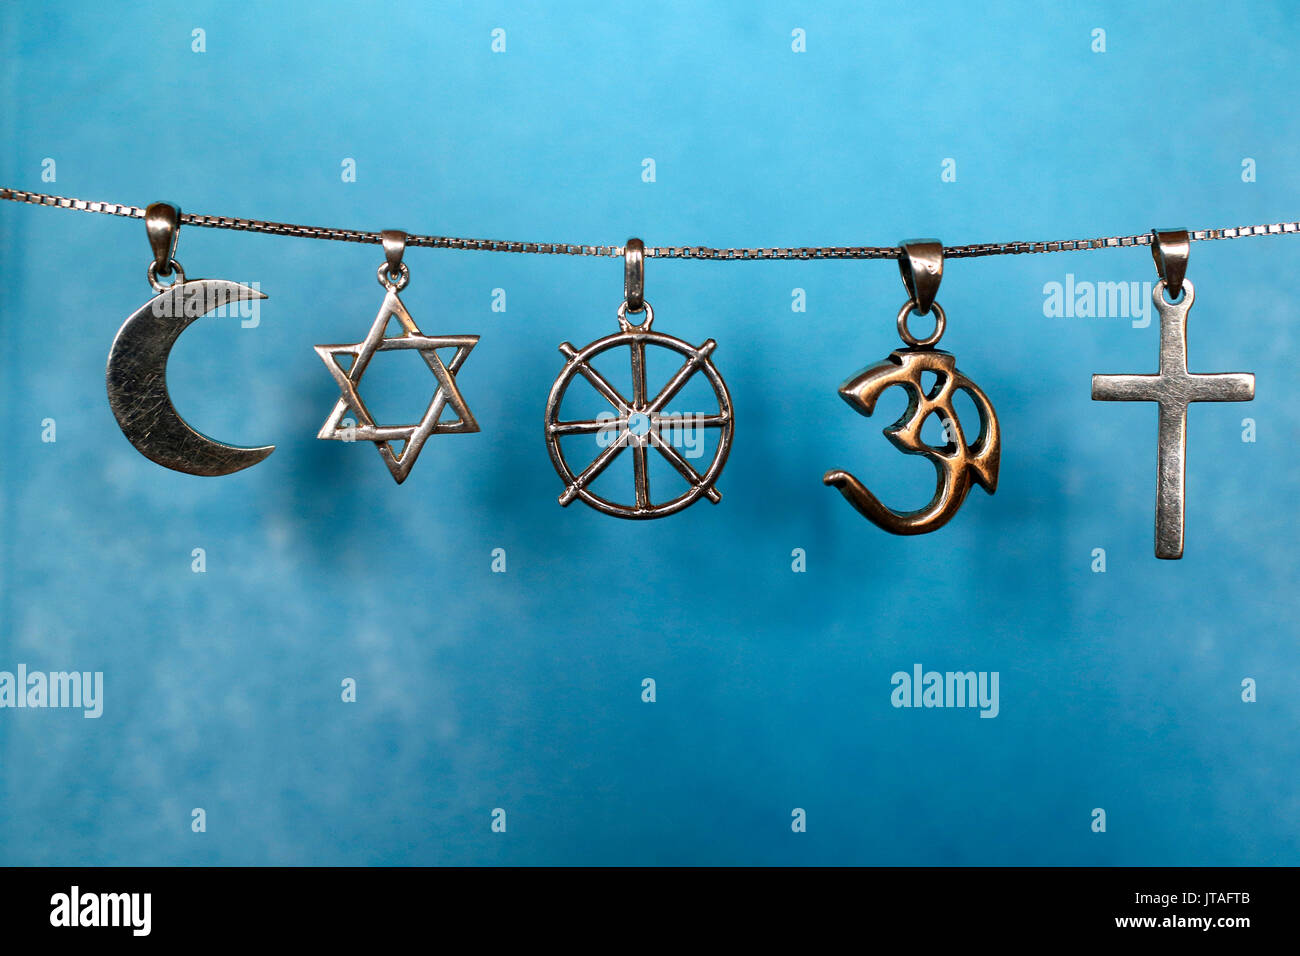 Symbols of Islam, Judaism, Buddhism, Hinduism and Christianity, Eure, France, Europe - Stock Image